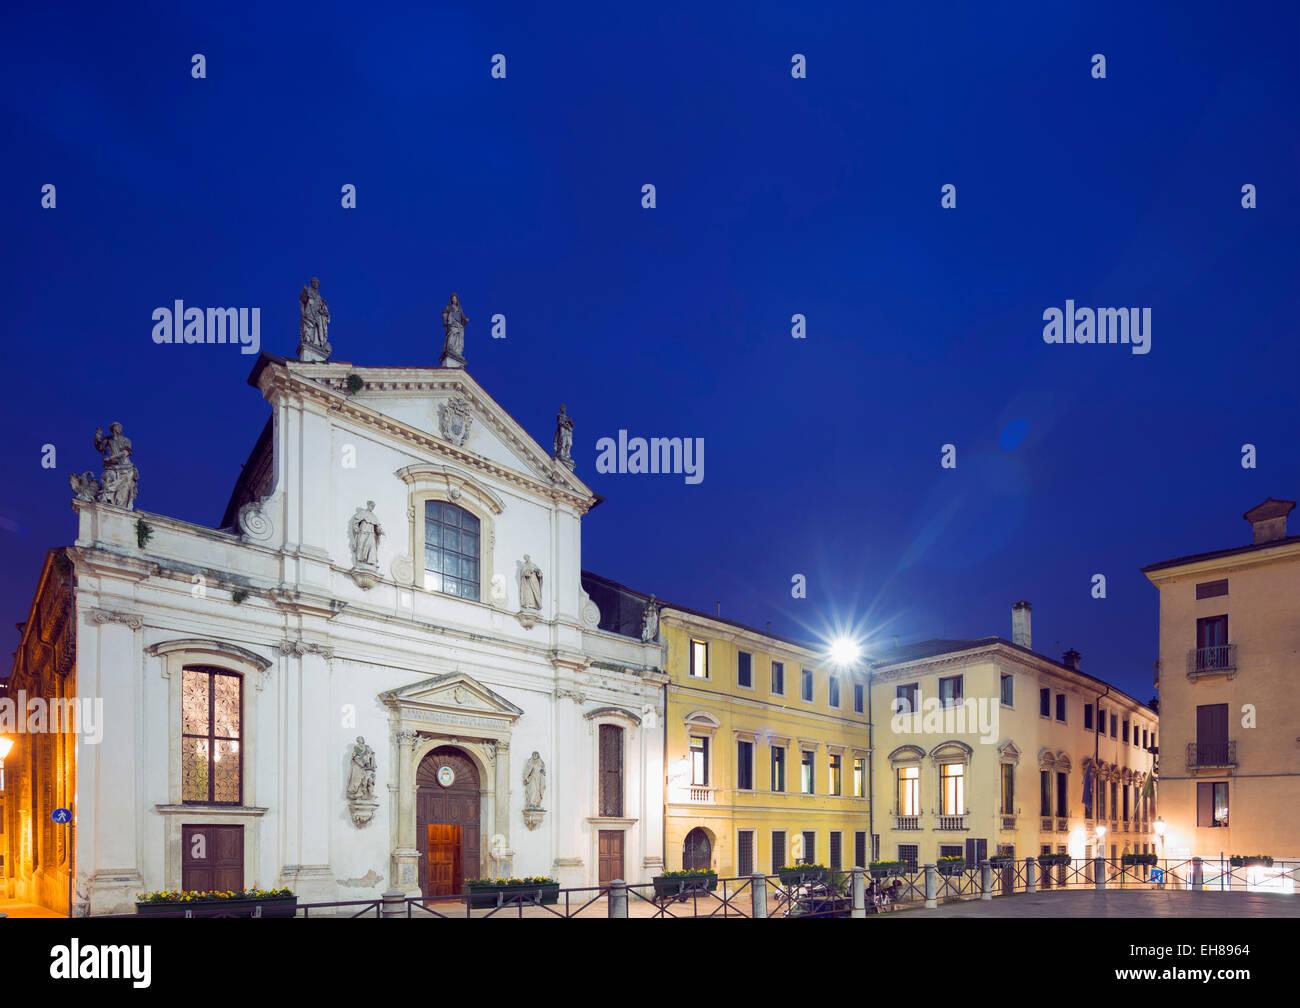 Santa Maria Church, Piazza Signori, Vicenza, UNESCO World Heritage Site, Veneto, Italy, Europe - Stock Image